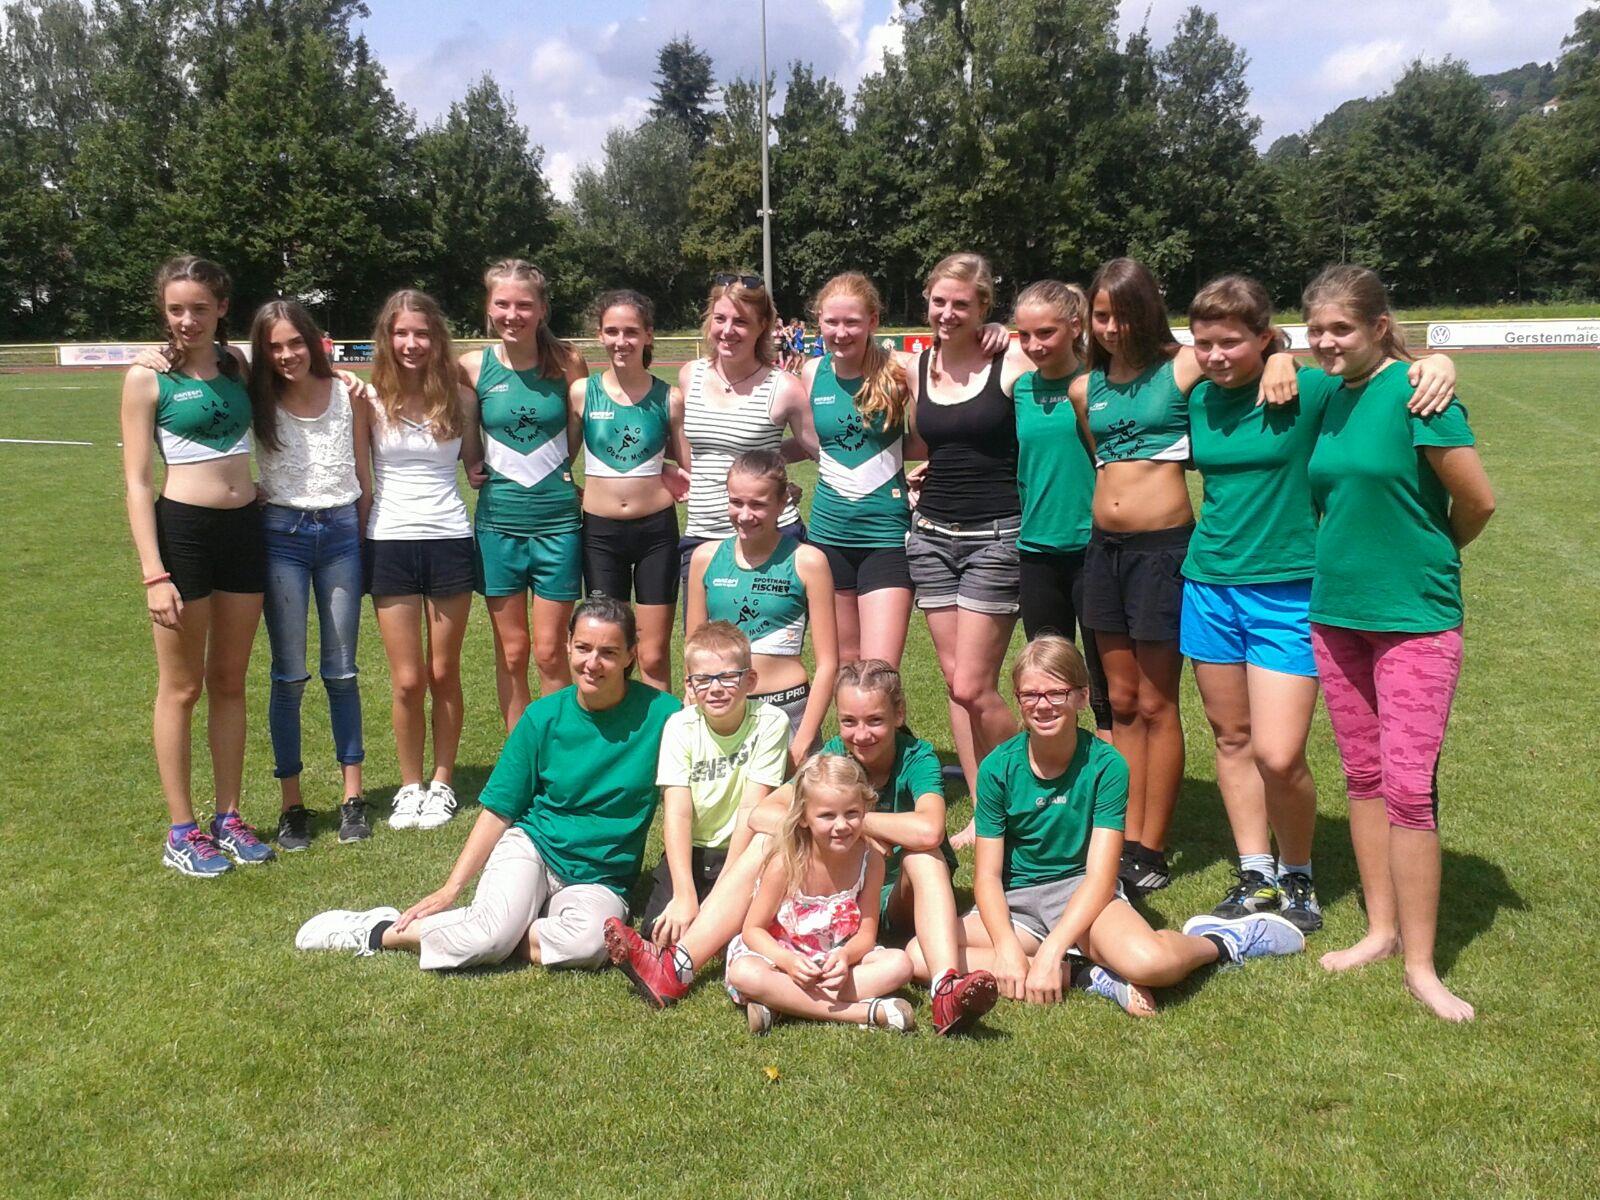 Deutsche Schüler-Mannschaftsmeisterschaft in Baden-Baden am 23.07.2016 (1)